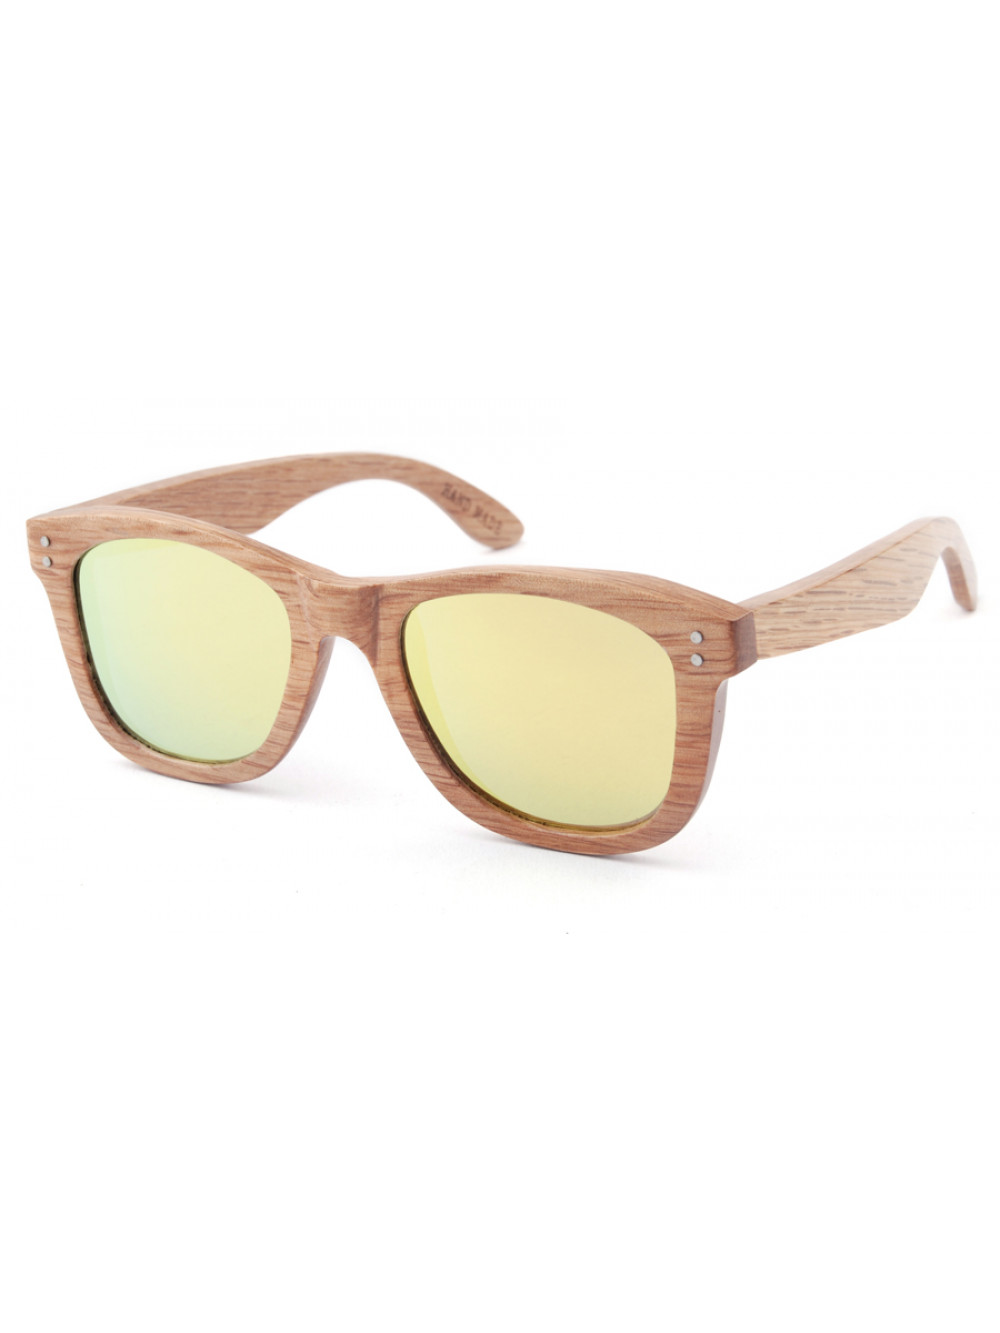 Drevené slnečné okuliare Simple Yellow